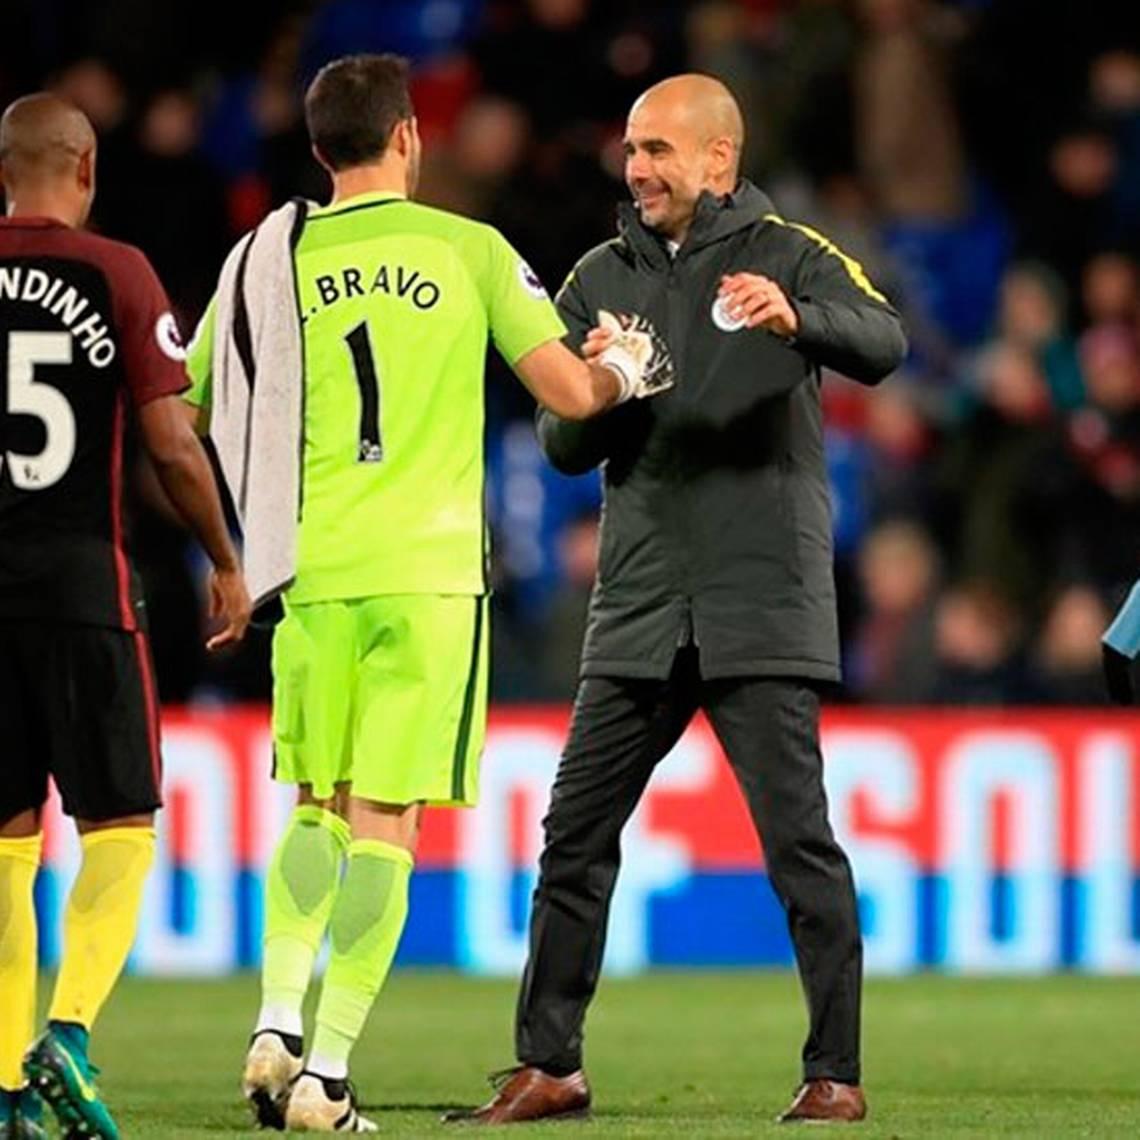 Pep Guardiola confirma a Claudio Bravo como titular para la próxima temporada